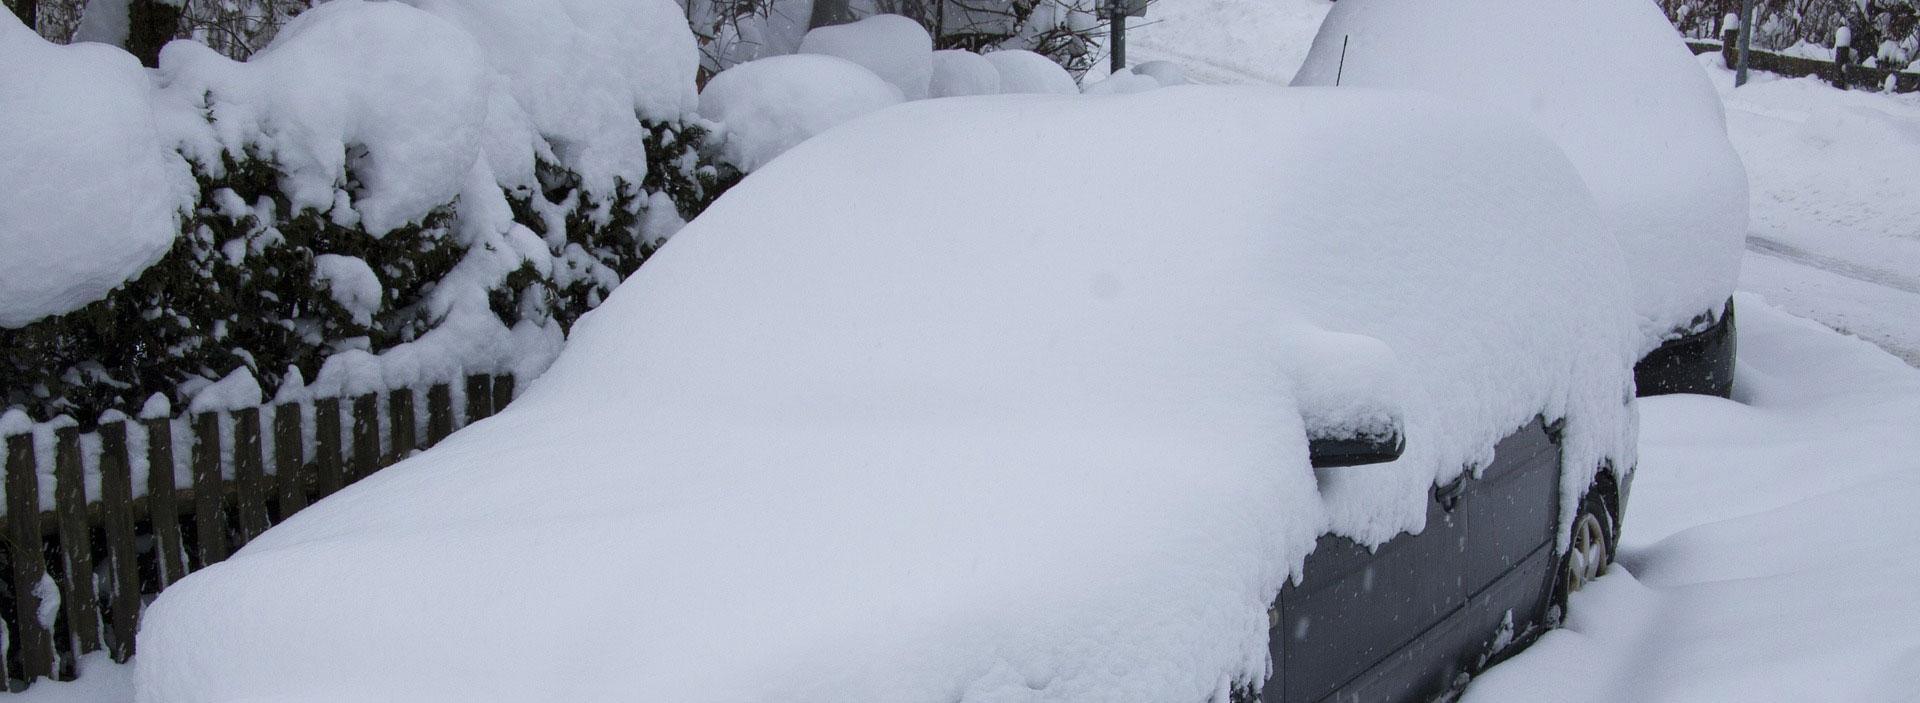 Winter Storm Preparedness Safety Tips Red Cross